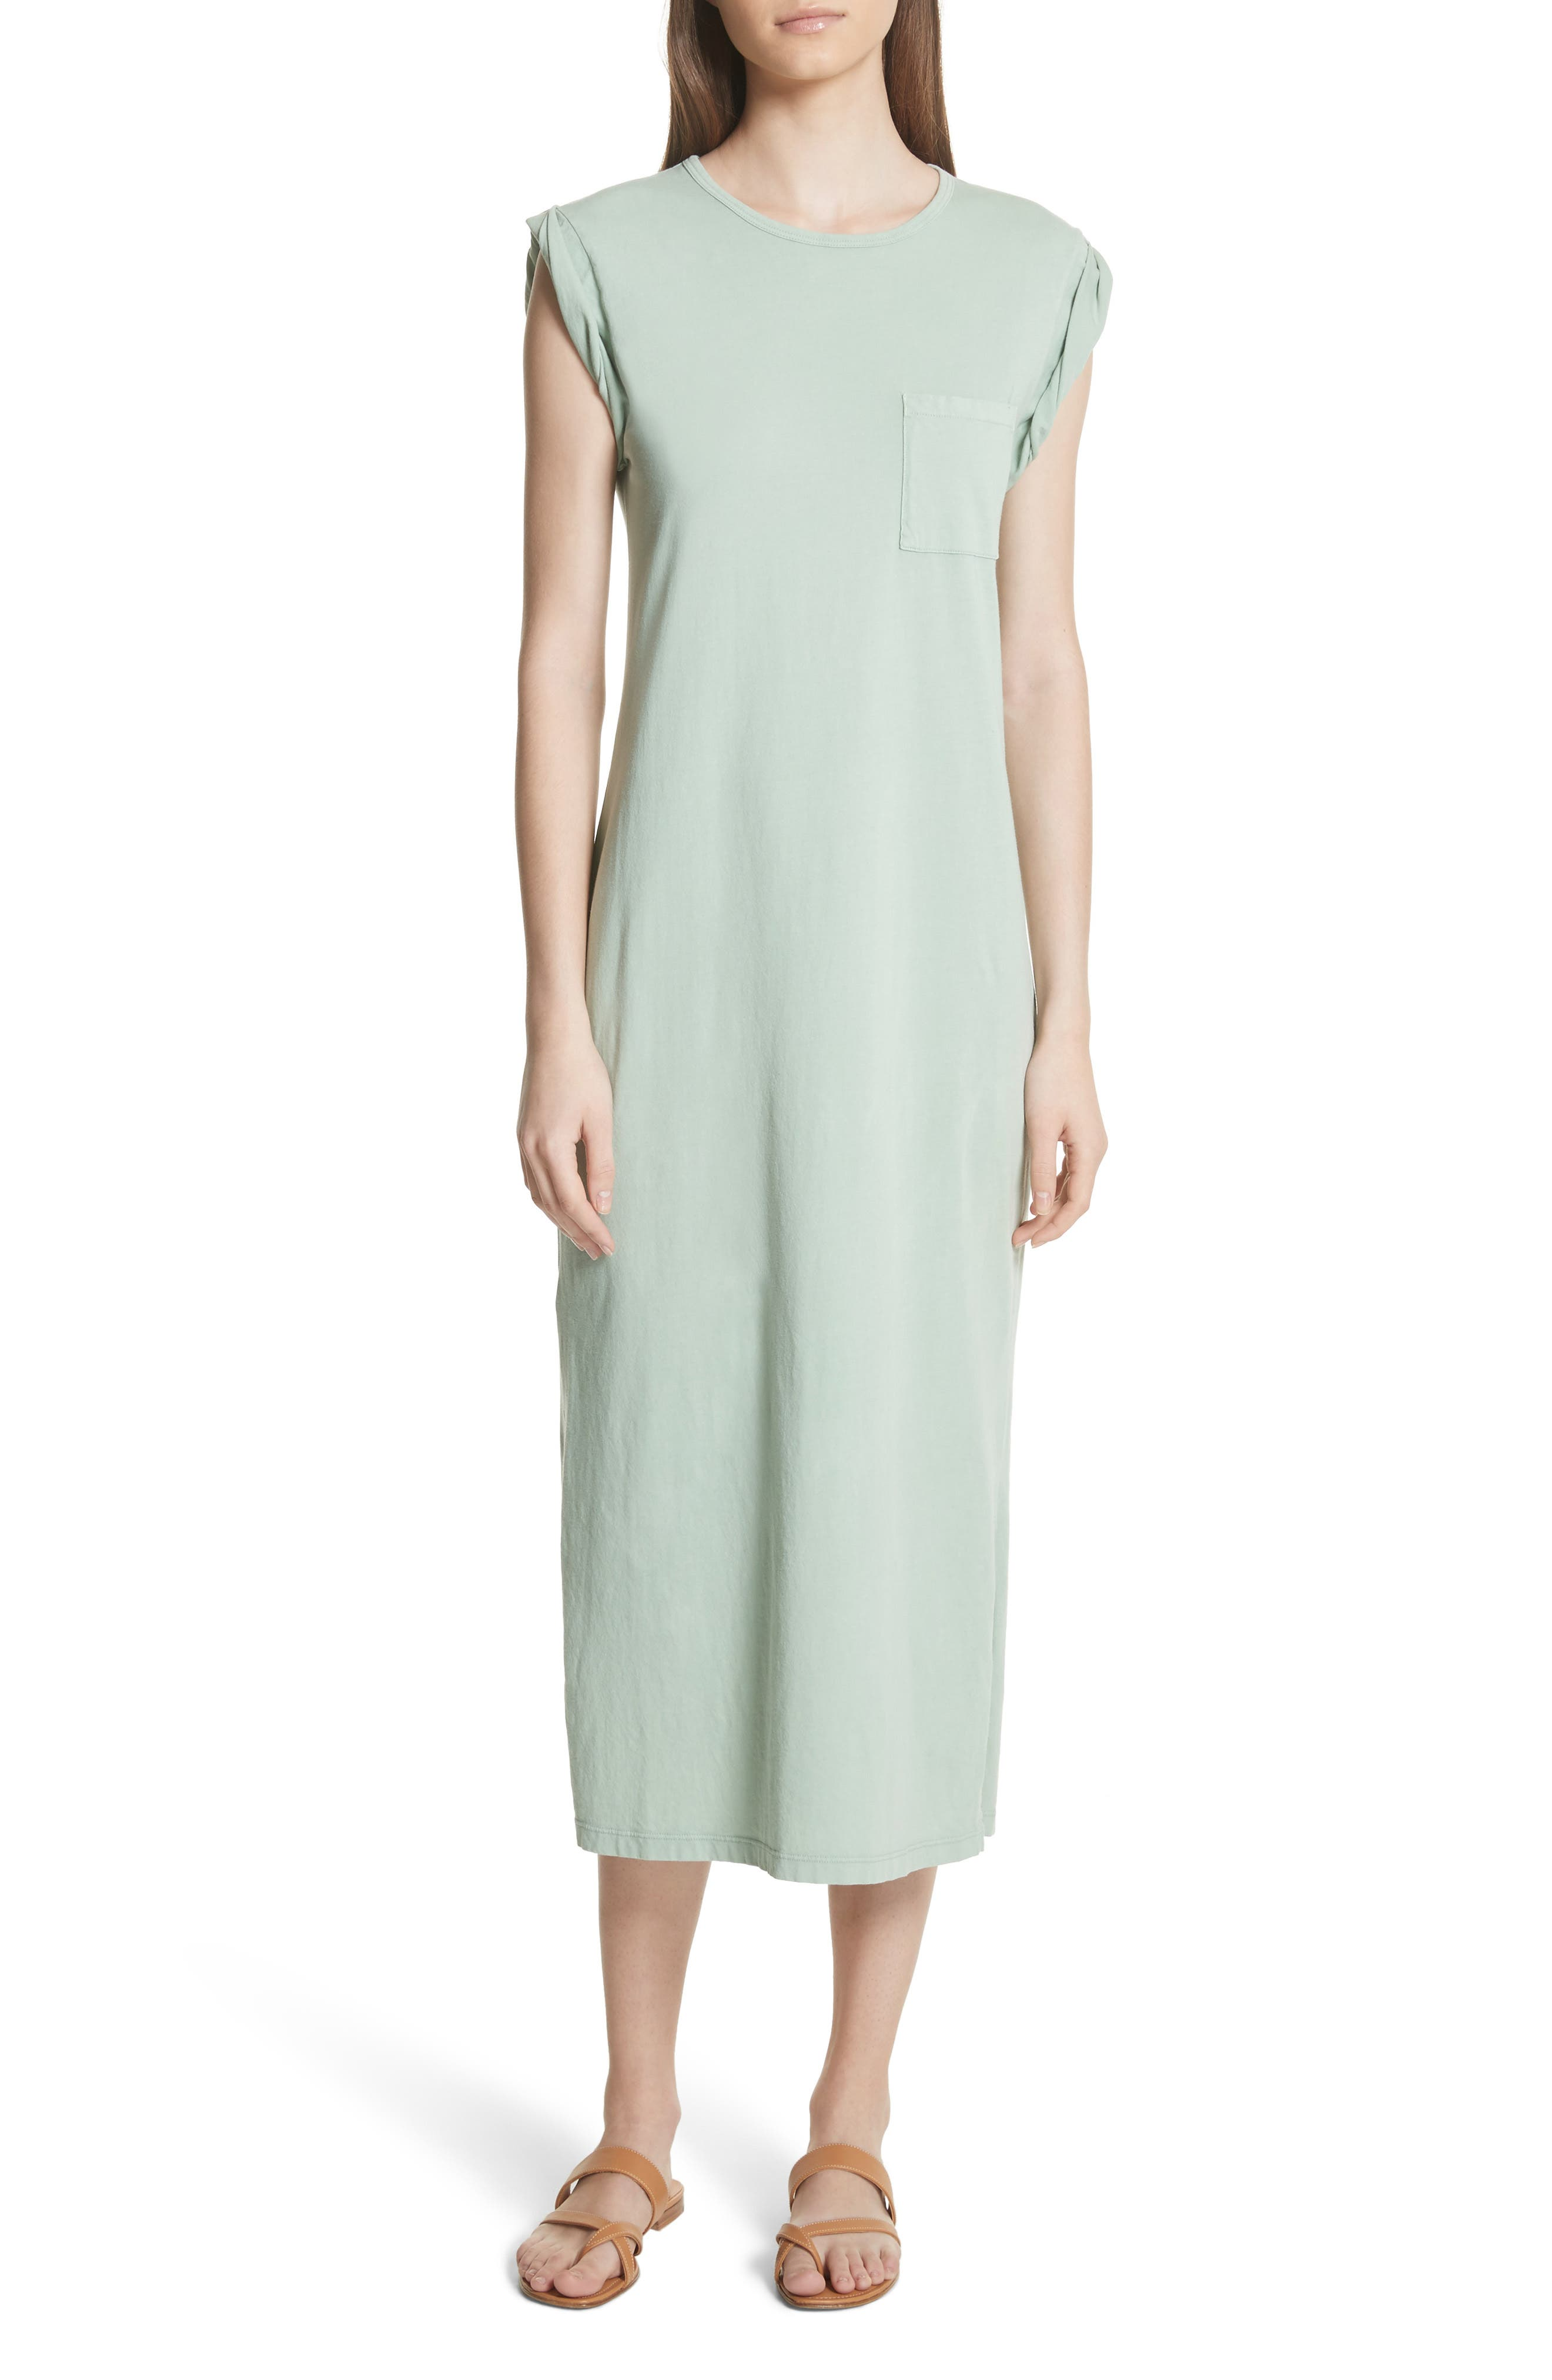 Muscle P Relaxed T-Shirt Dress,                         Main,                         color, Light Moss